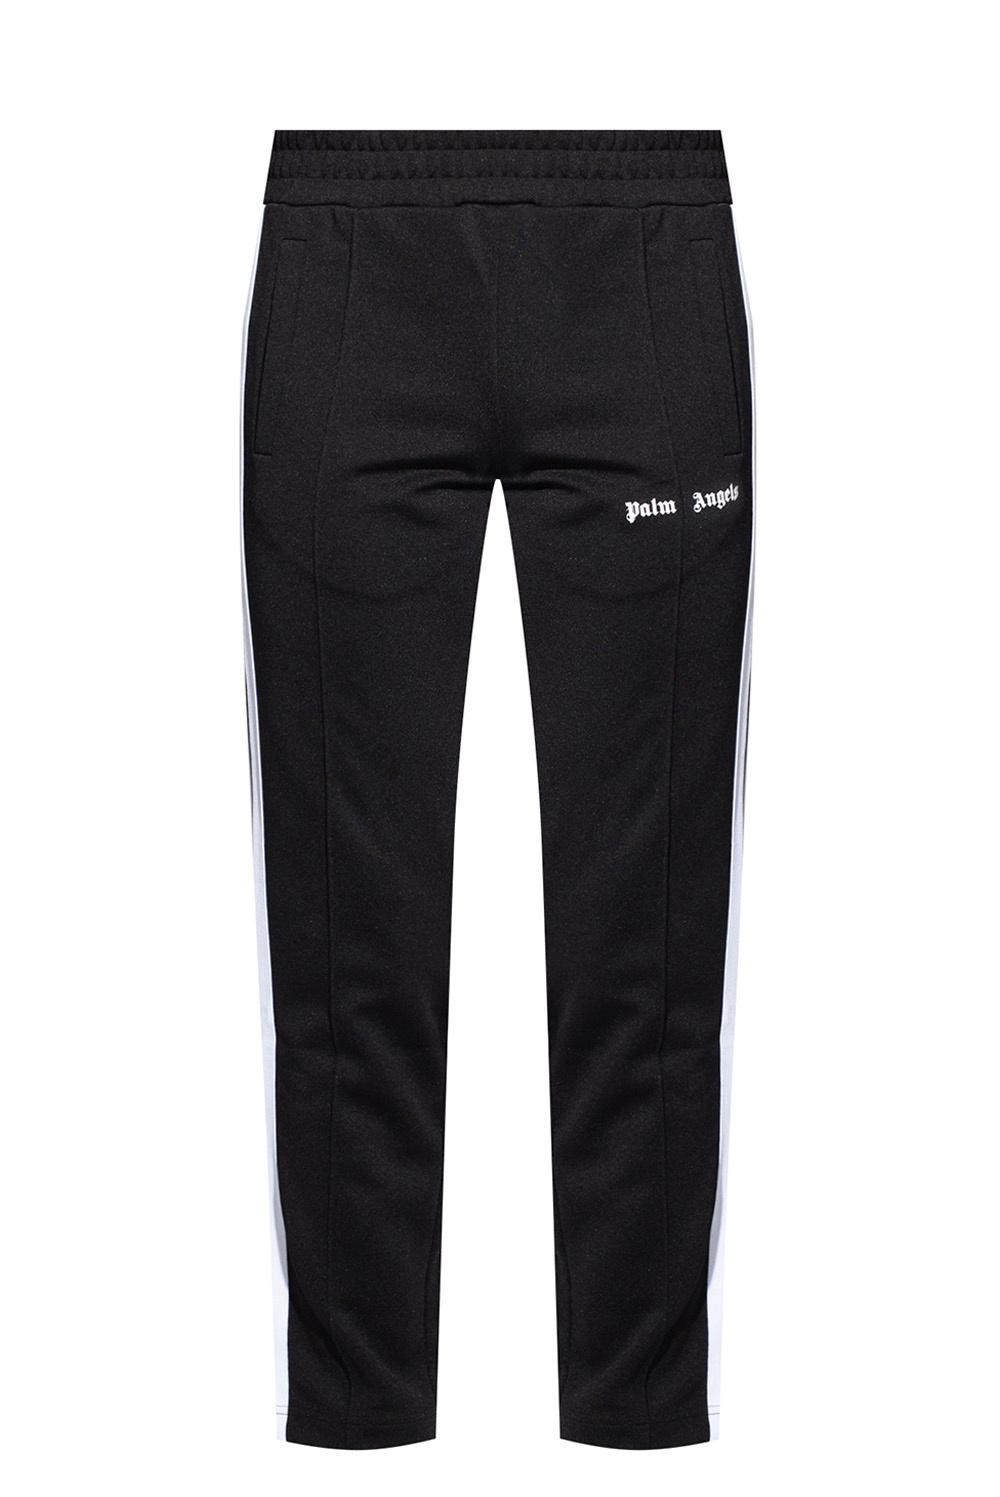 Palm Angels logo长裤